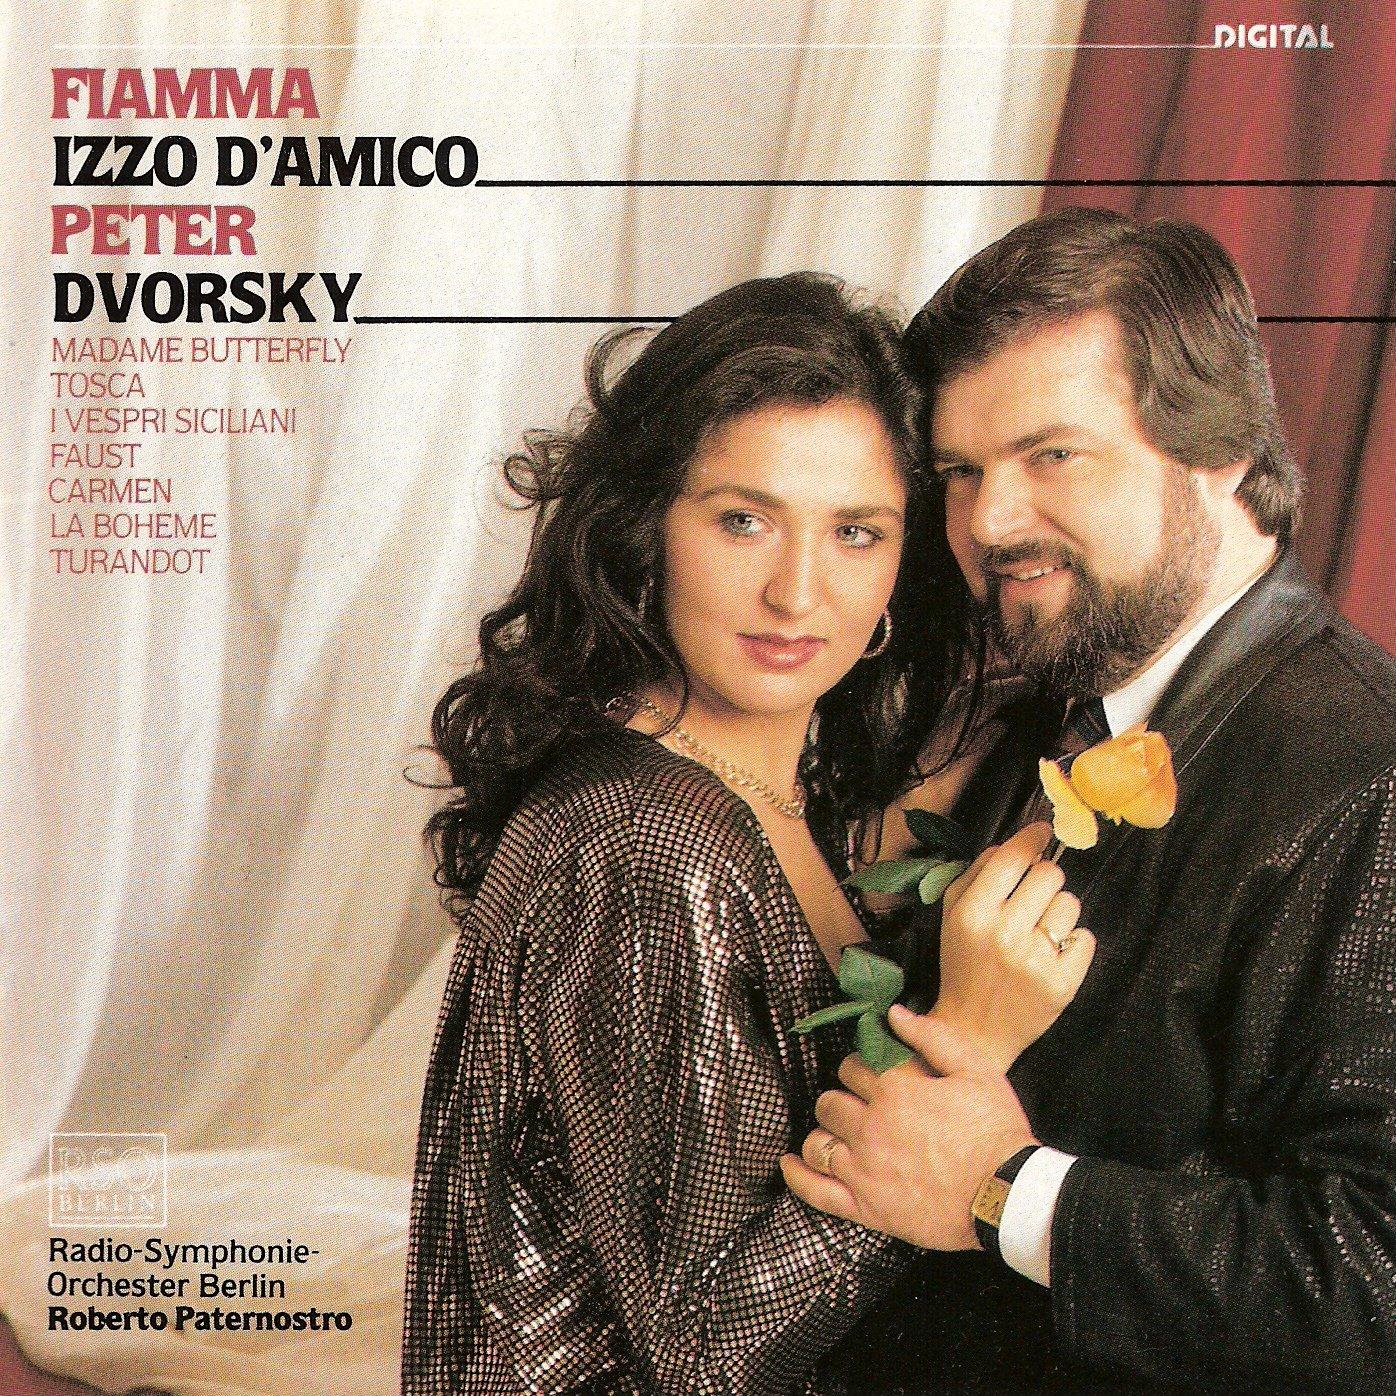 Fiamma Izzo D'Amico / Peter Dvorsky - : Amazon.de: Musik